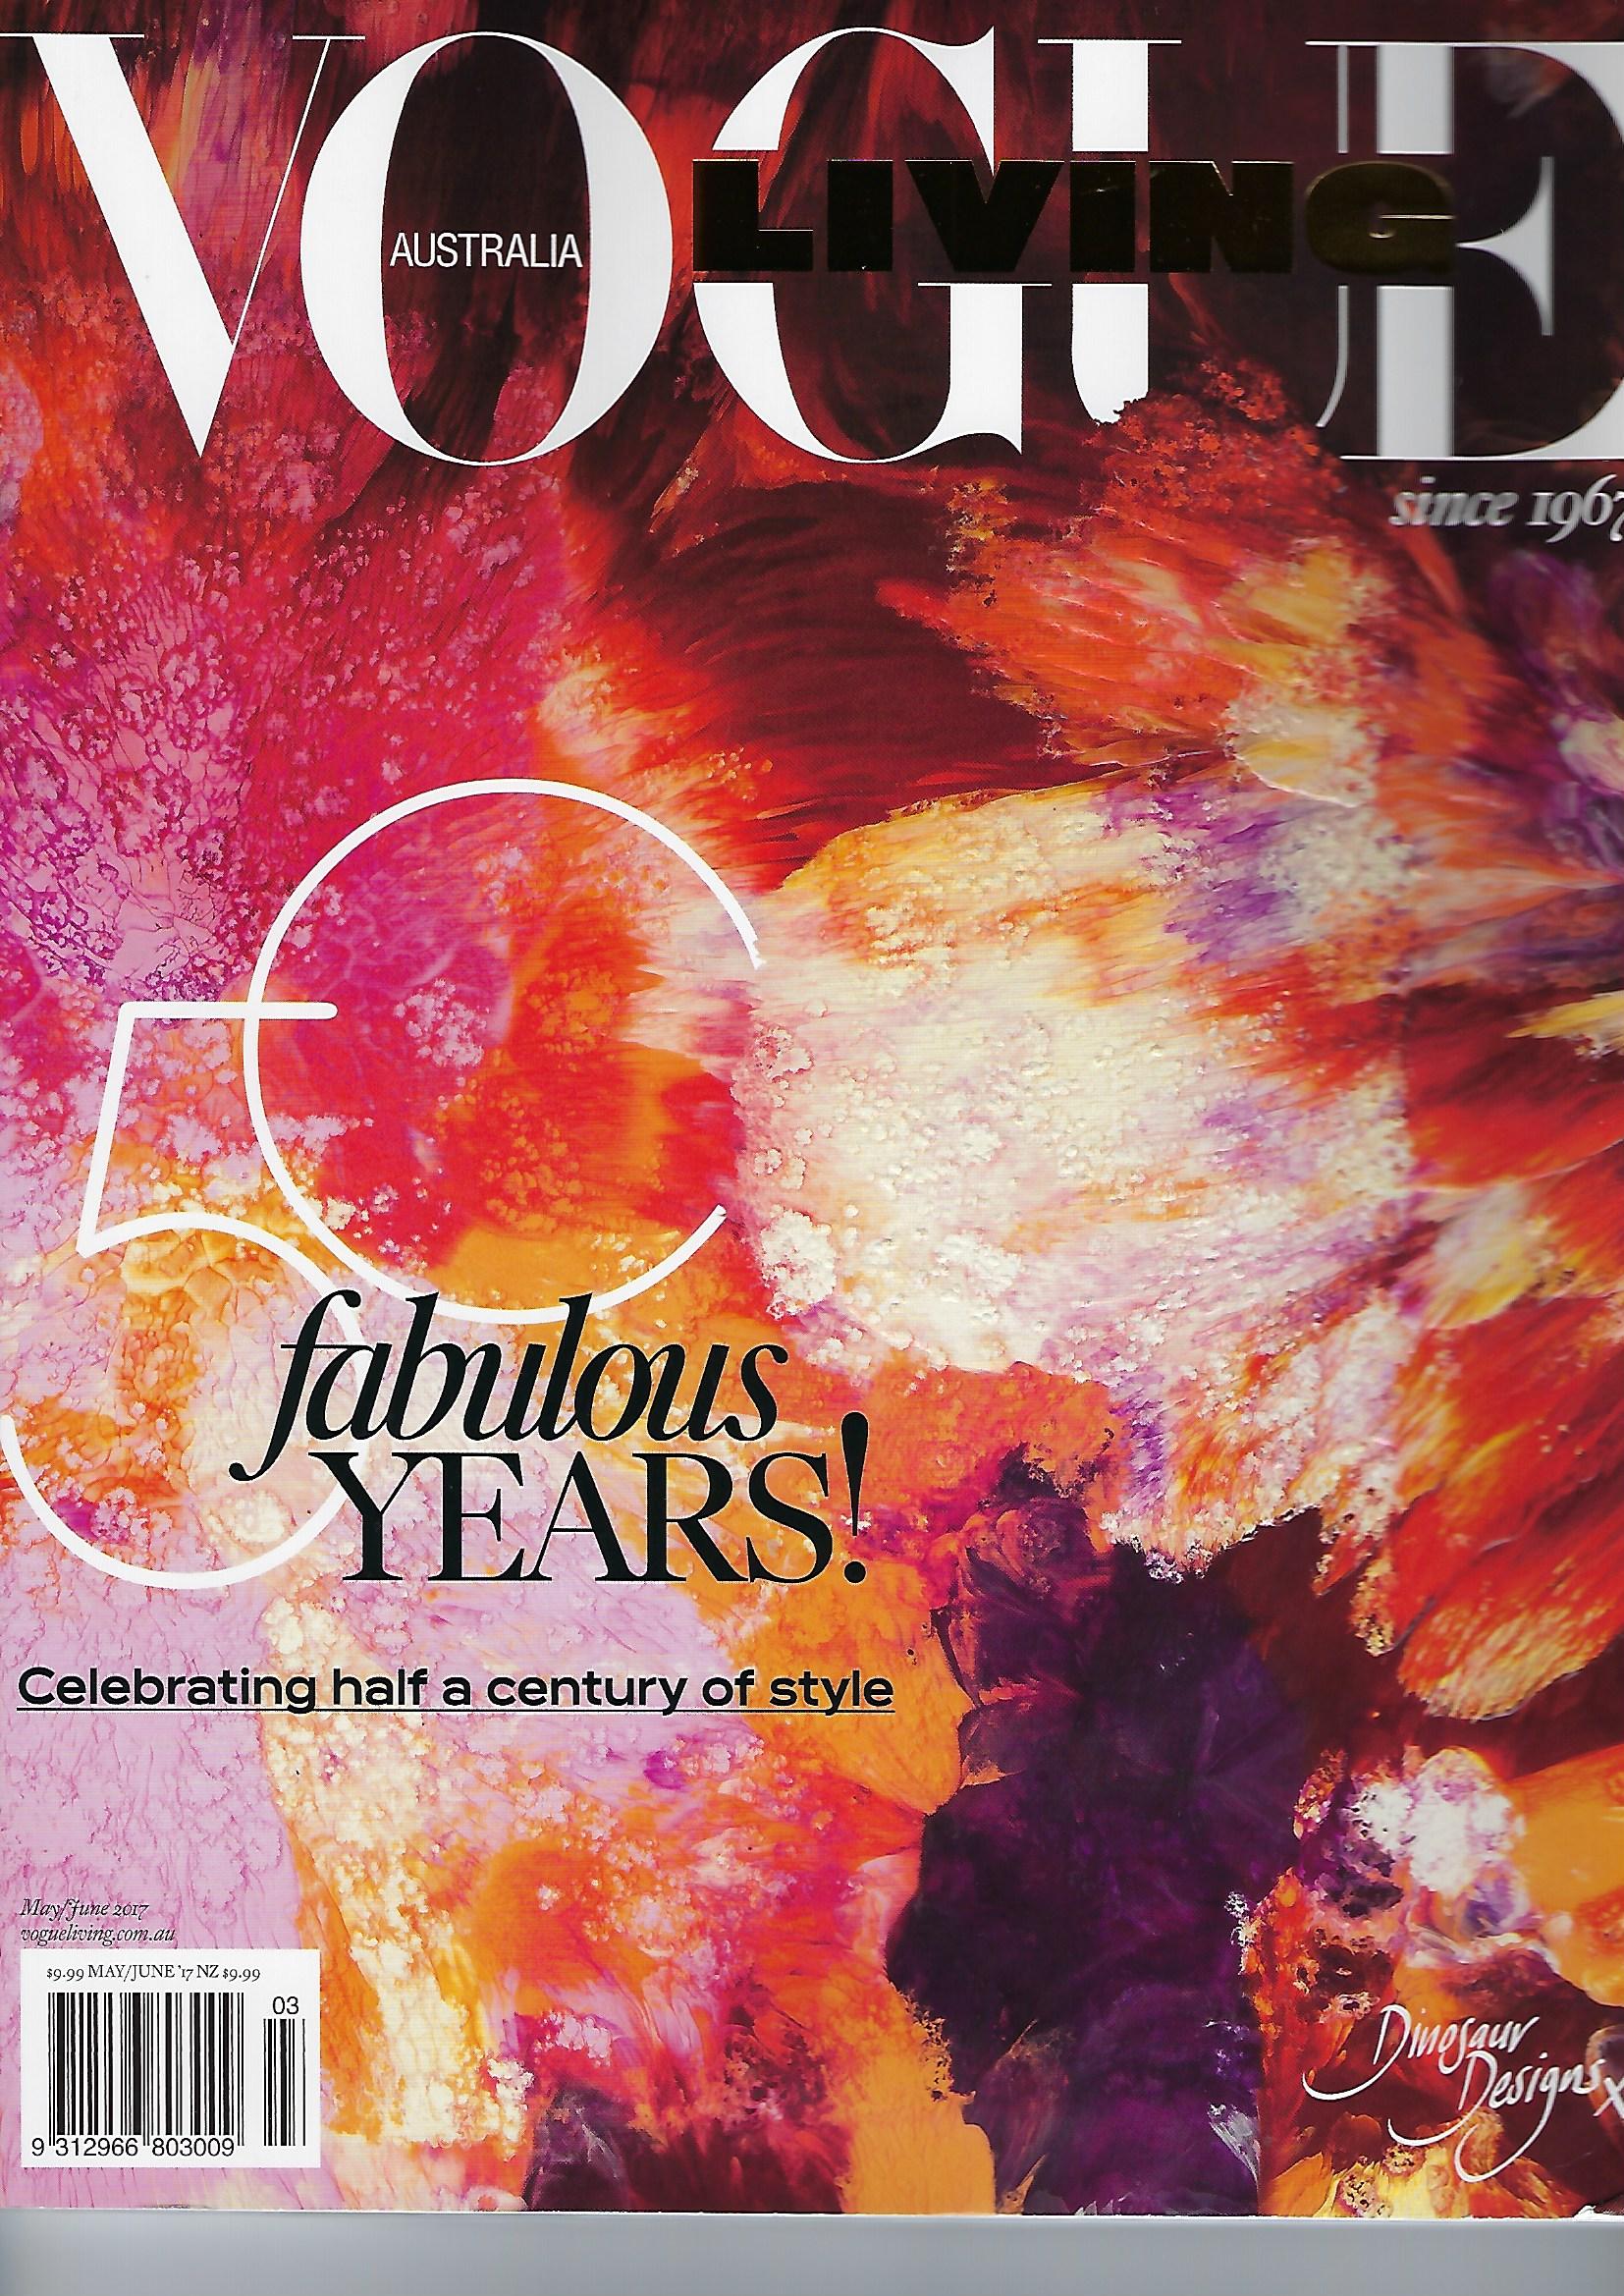 vogue-living-50-yrs-may-june-2017.jpeg